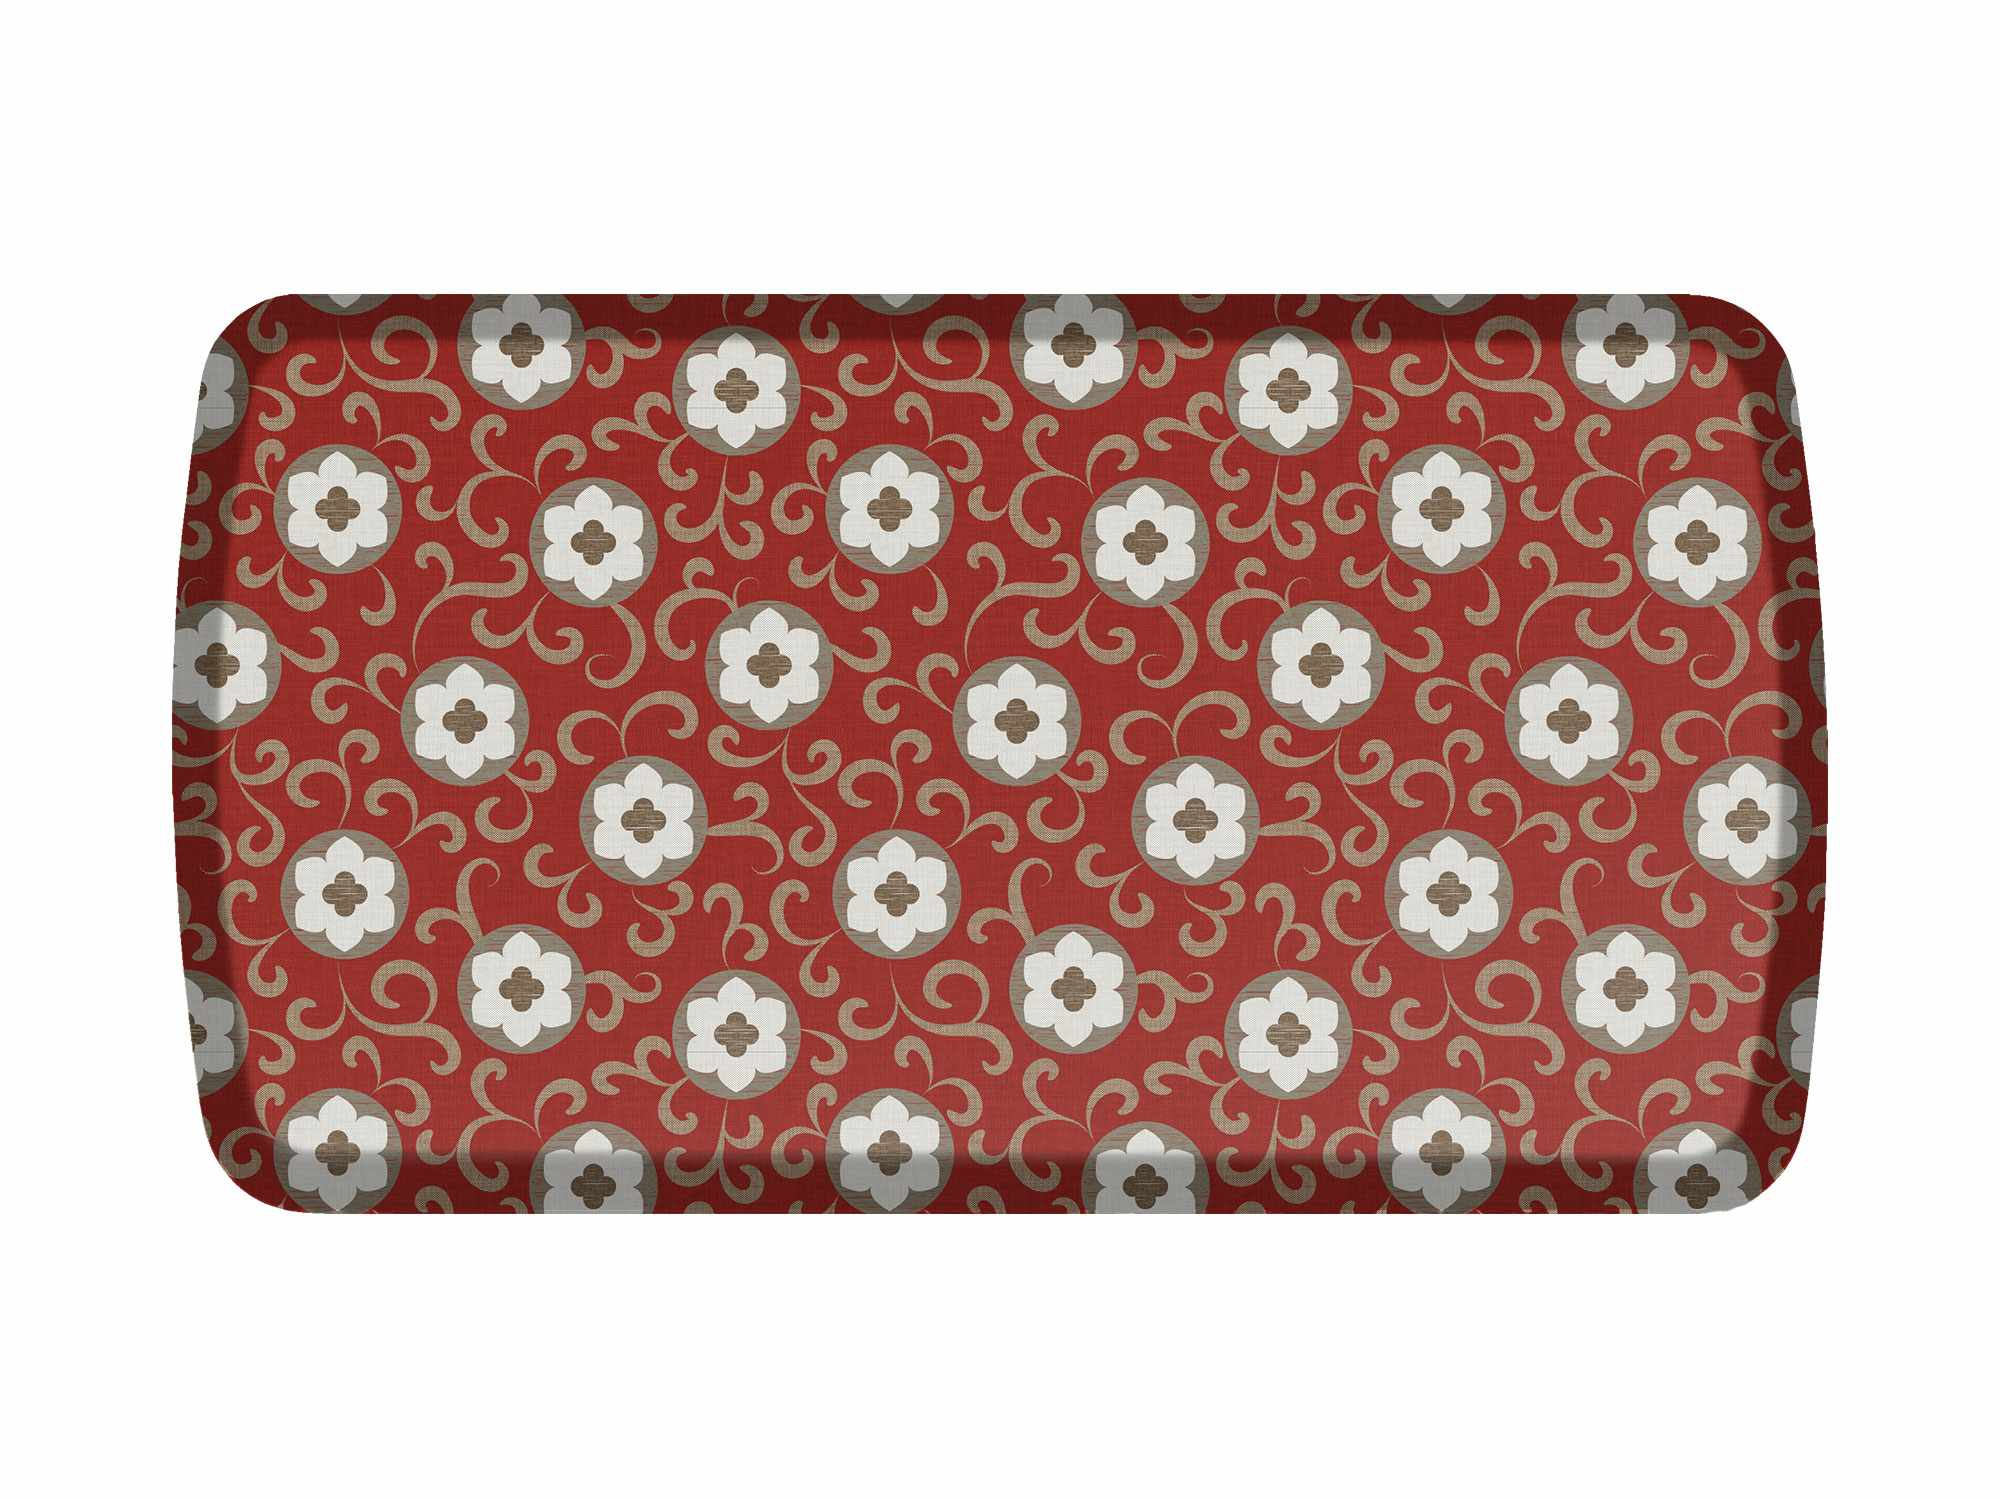 Charmant Flower Floor Mats | Comfort Chef Kitchen Mat